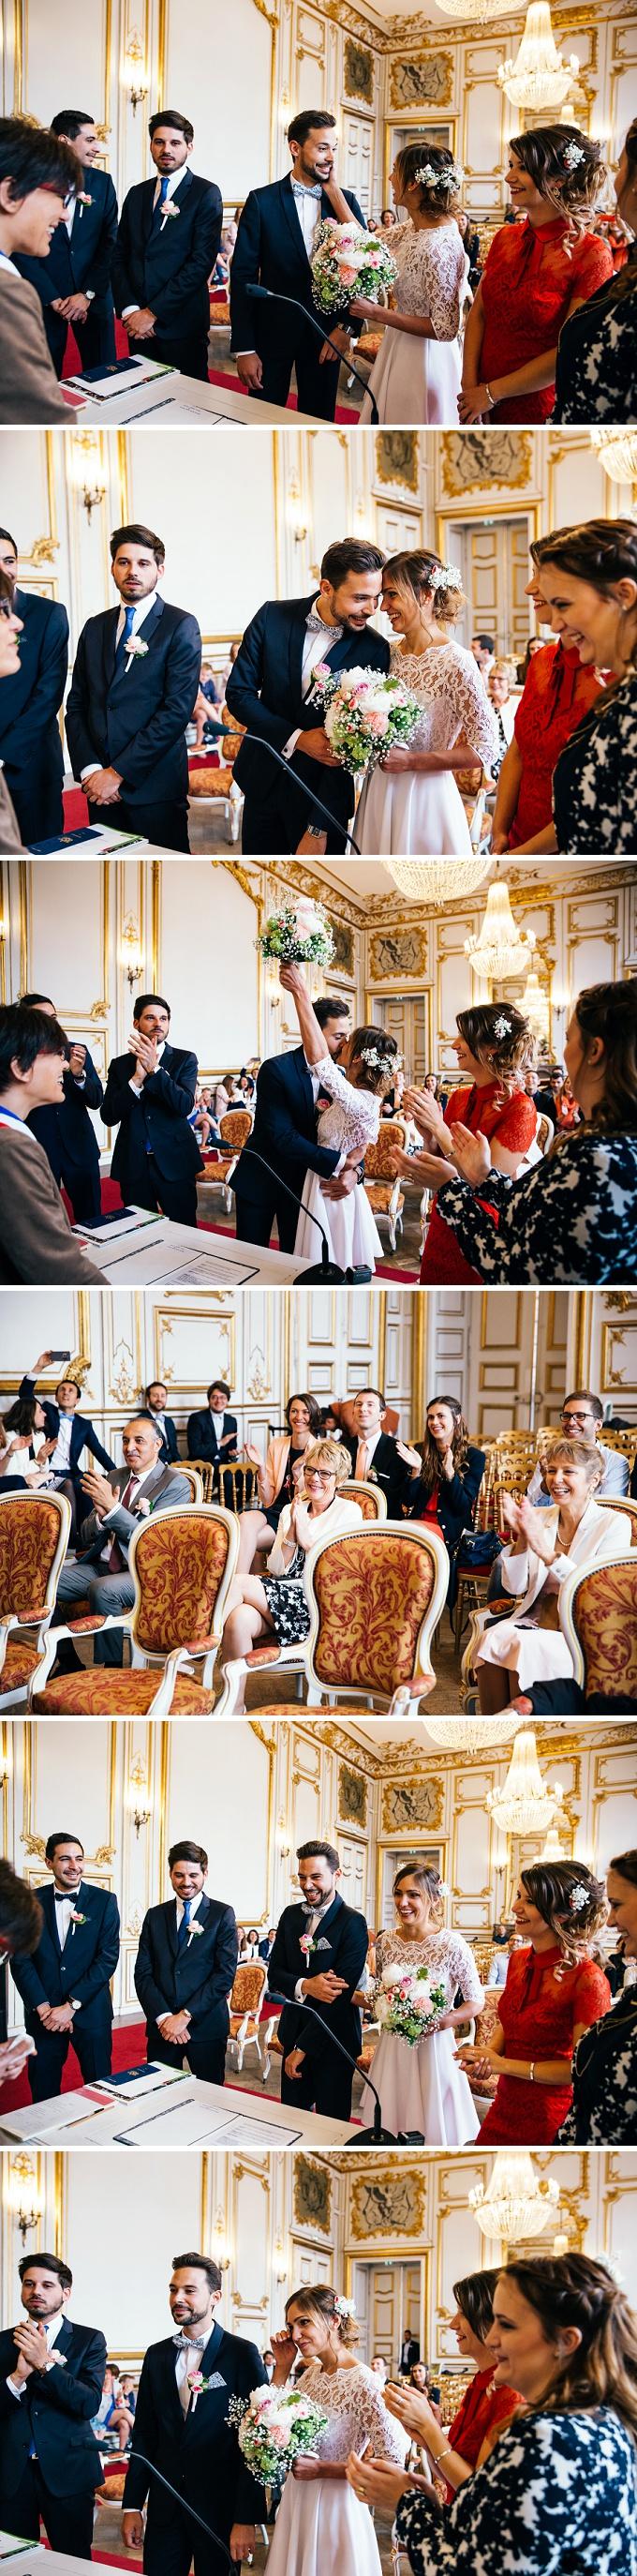 mariage-chateau-dosthoffen-006.jpg